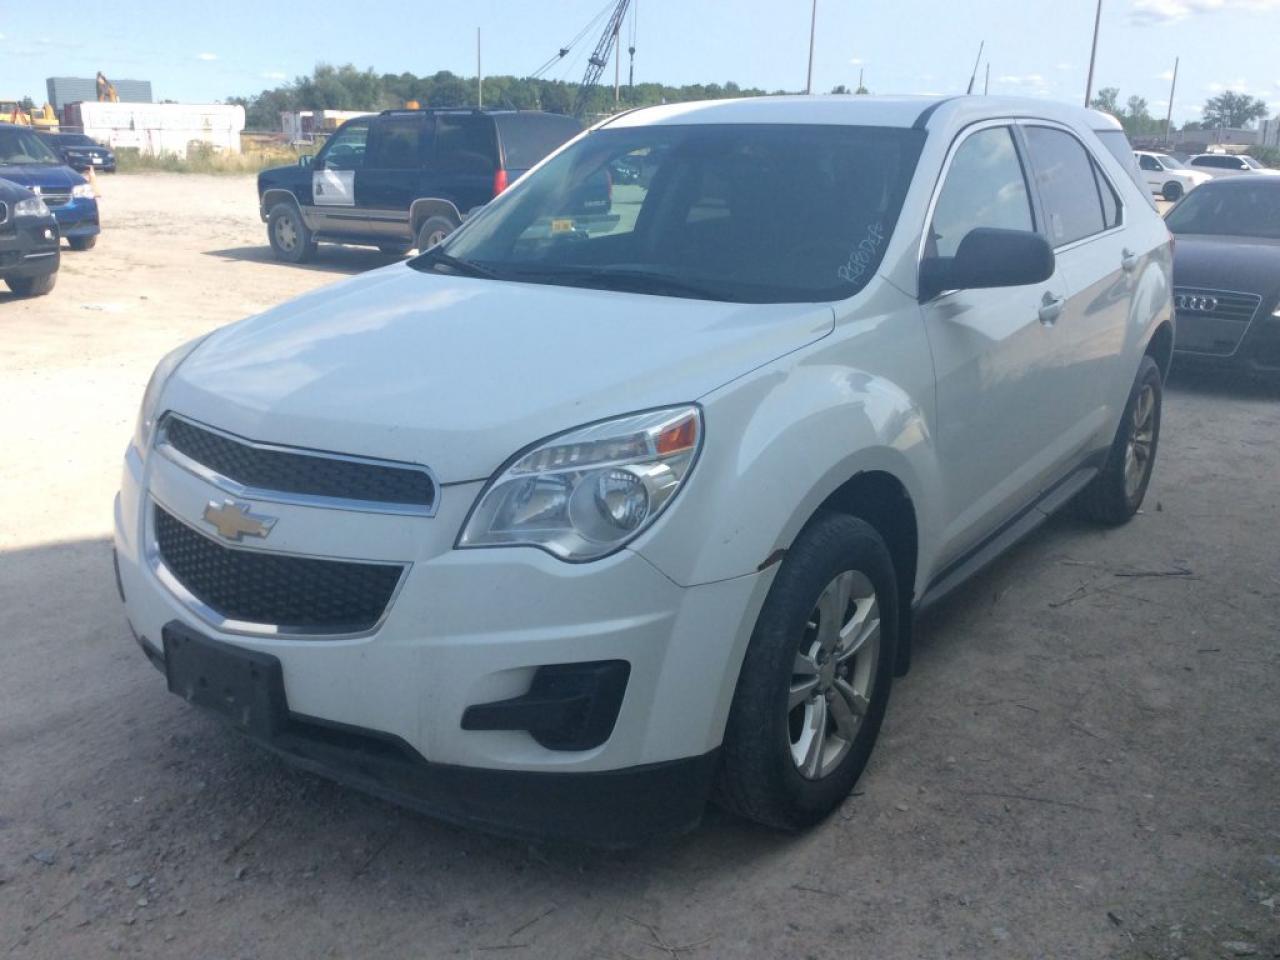 Photo of White 2012 Chevrolet Equinox